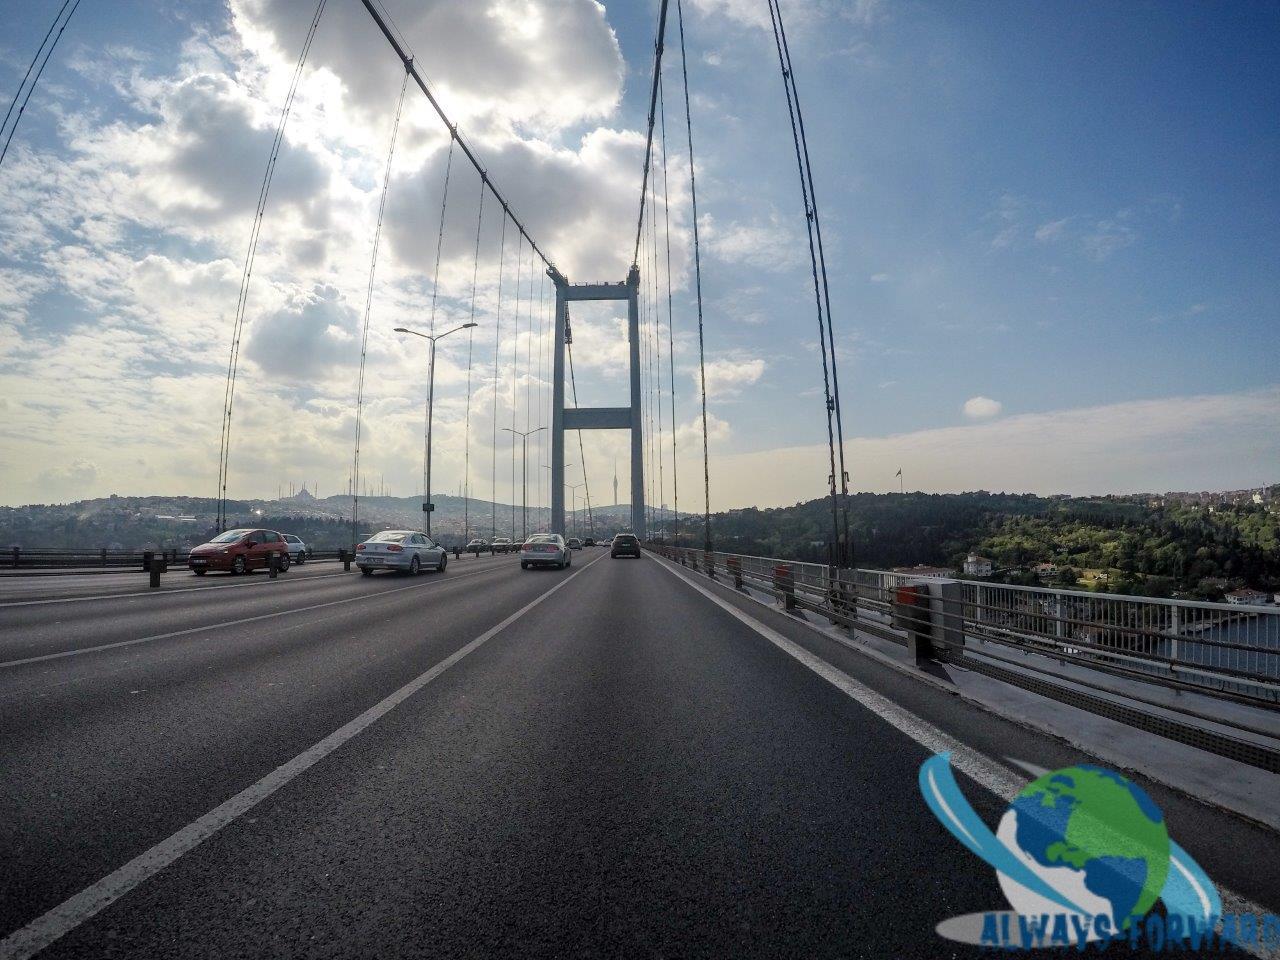 Bosporus-Brücke (verbindung Europa-Asien)